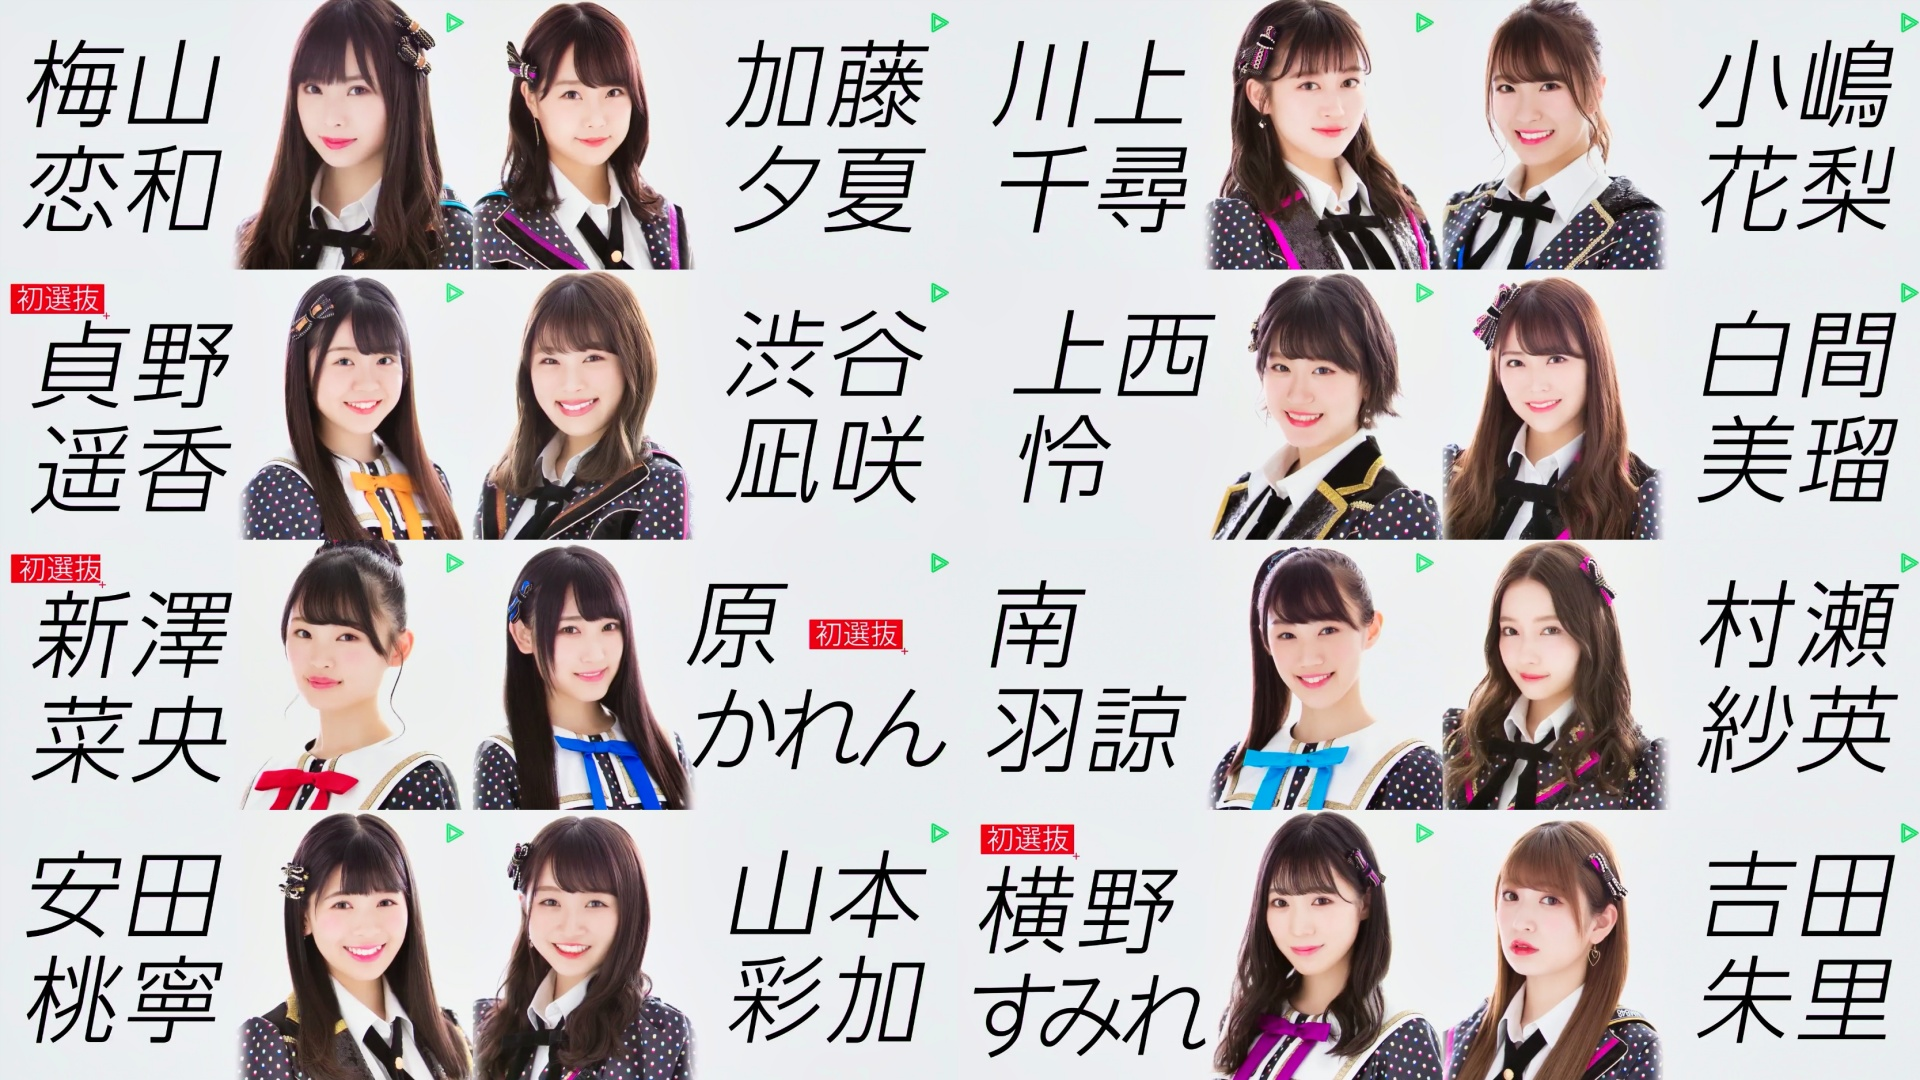 【NMB48】5月13日に23rdシングル発売、選抜メンバー16名が発表